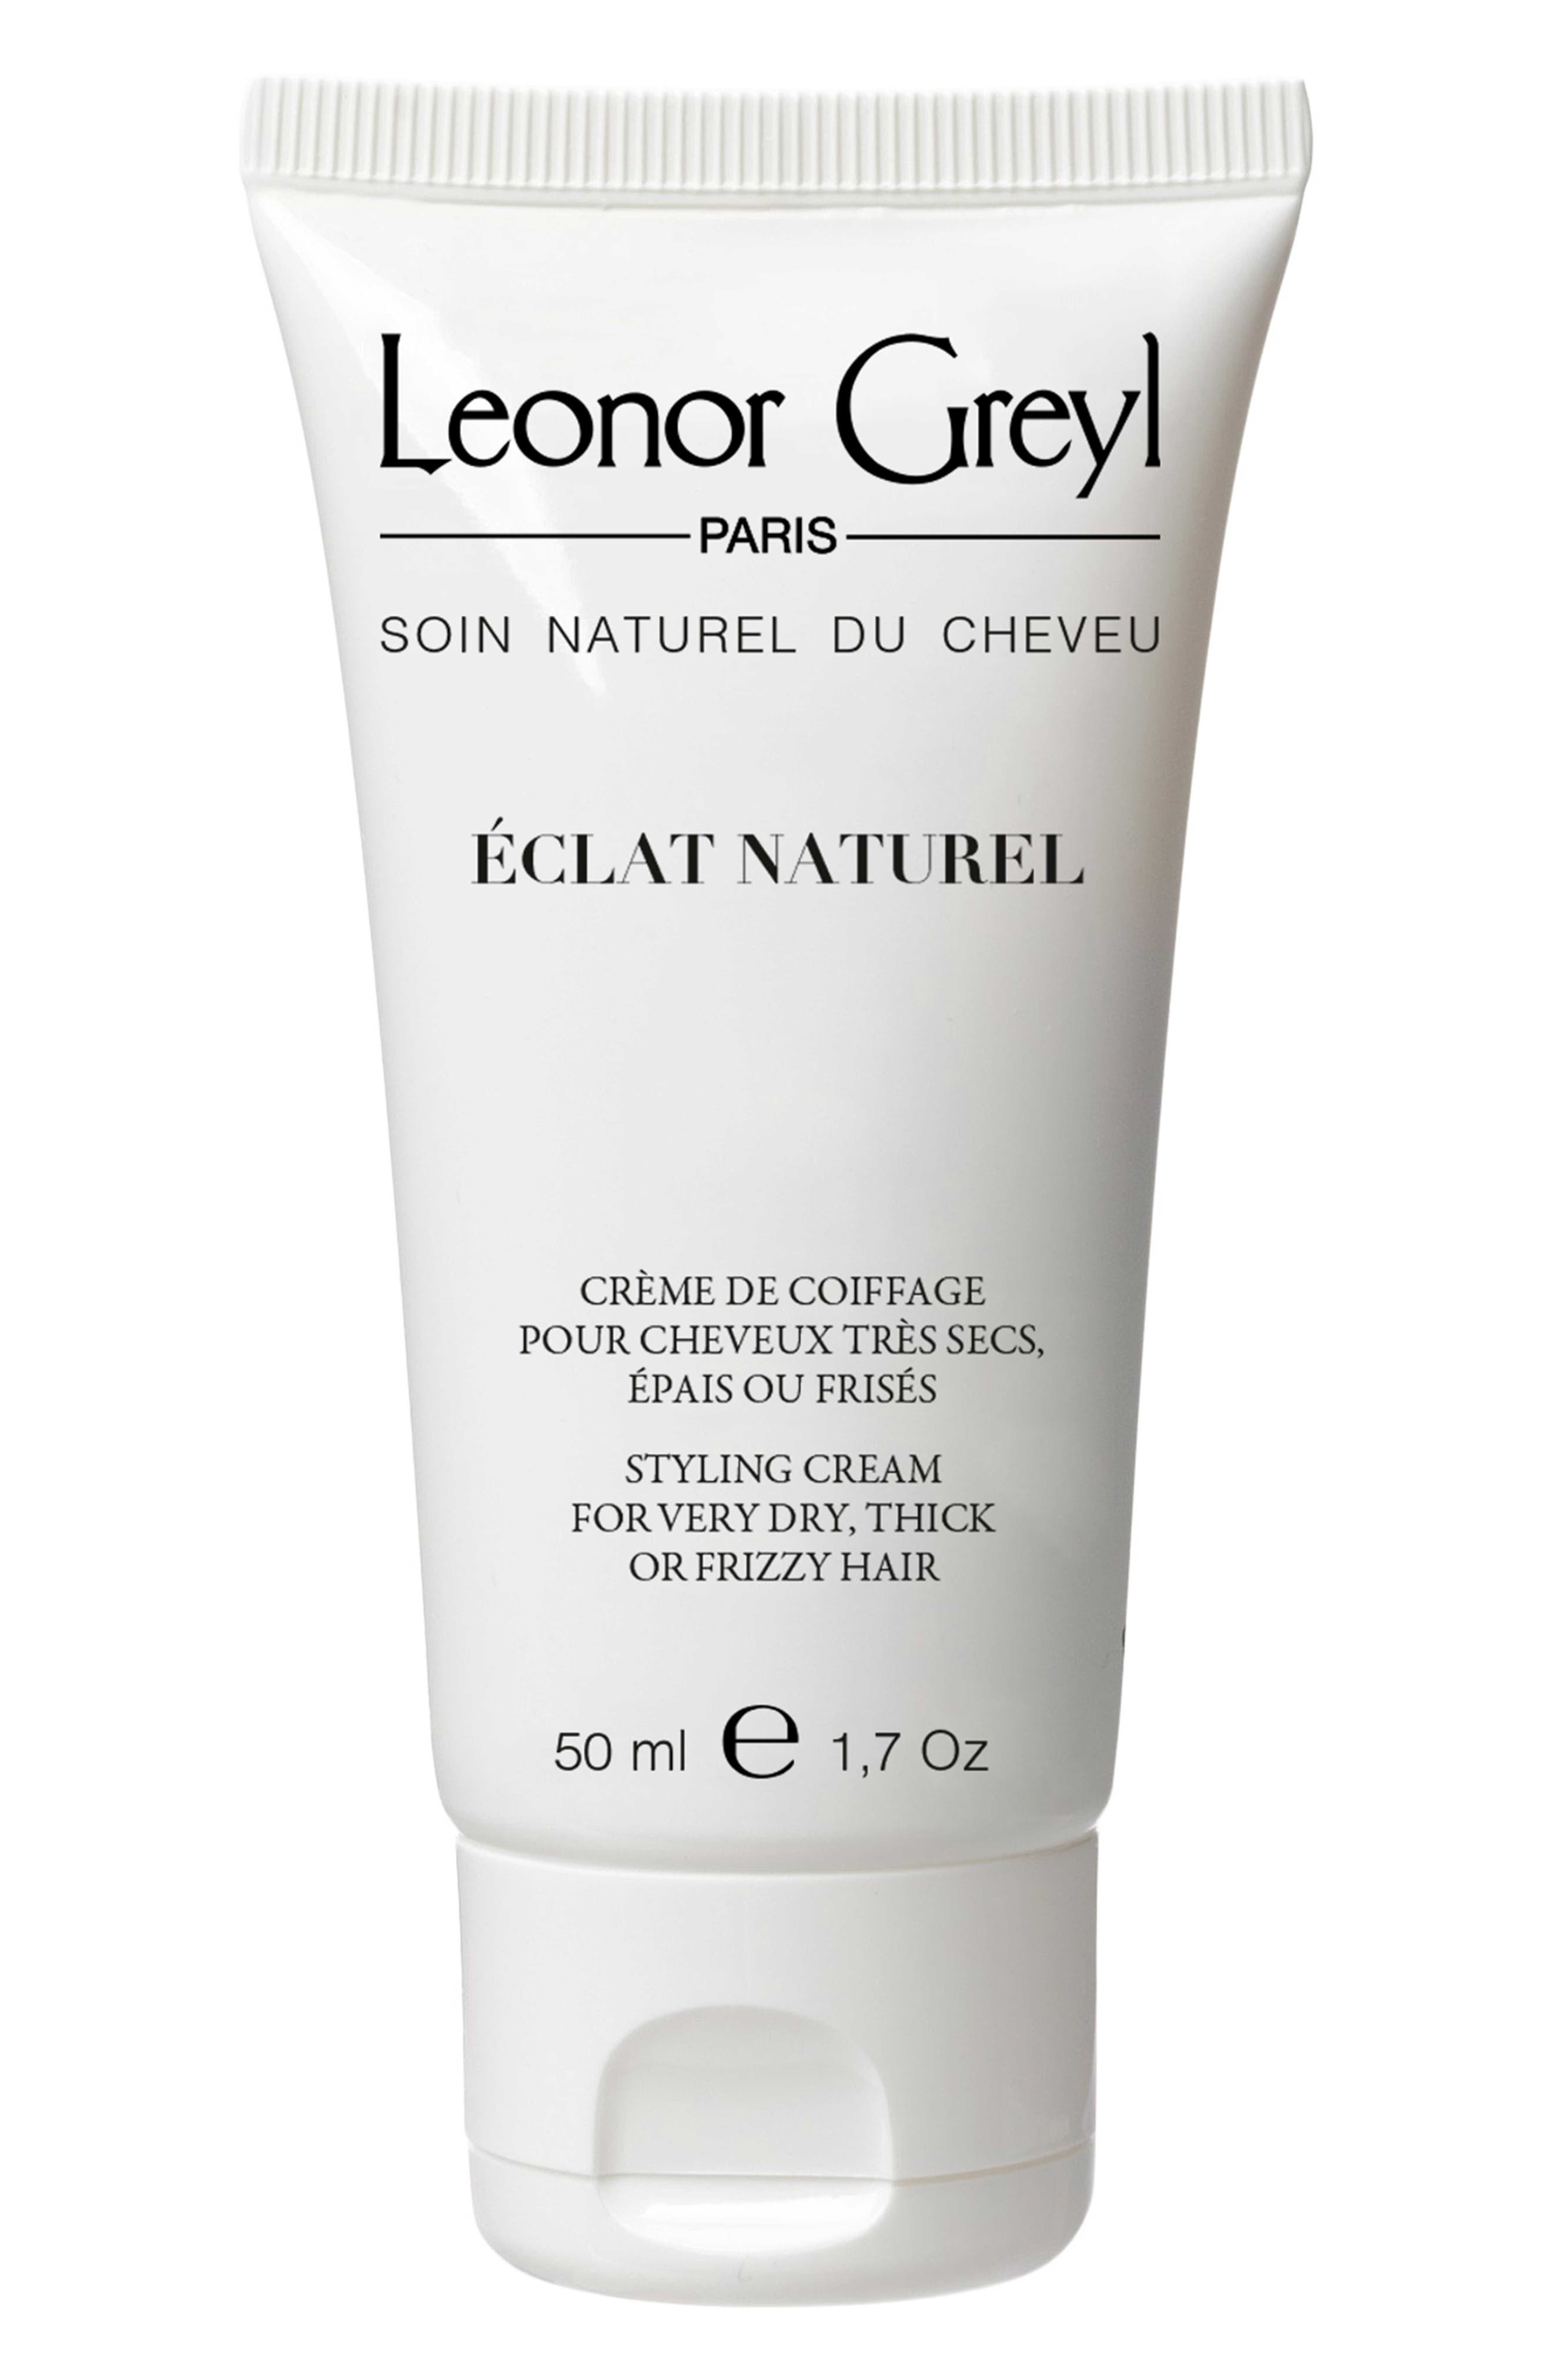 Leonor Greyl PARIS 'Éclat Naturel' Styling Cream